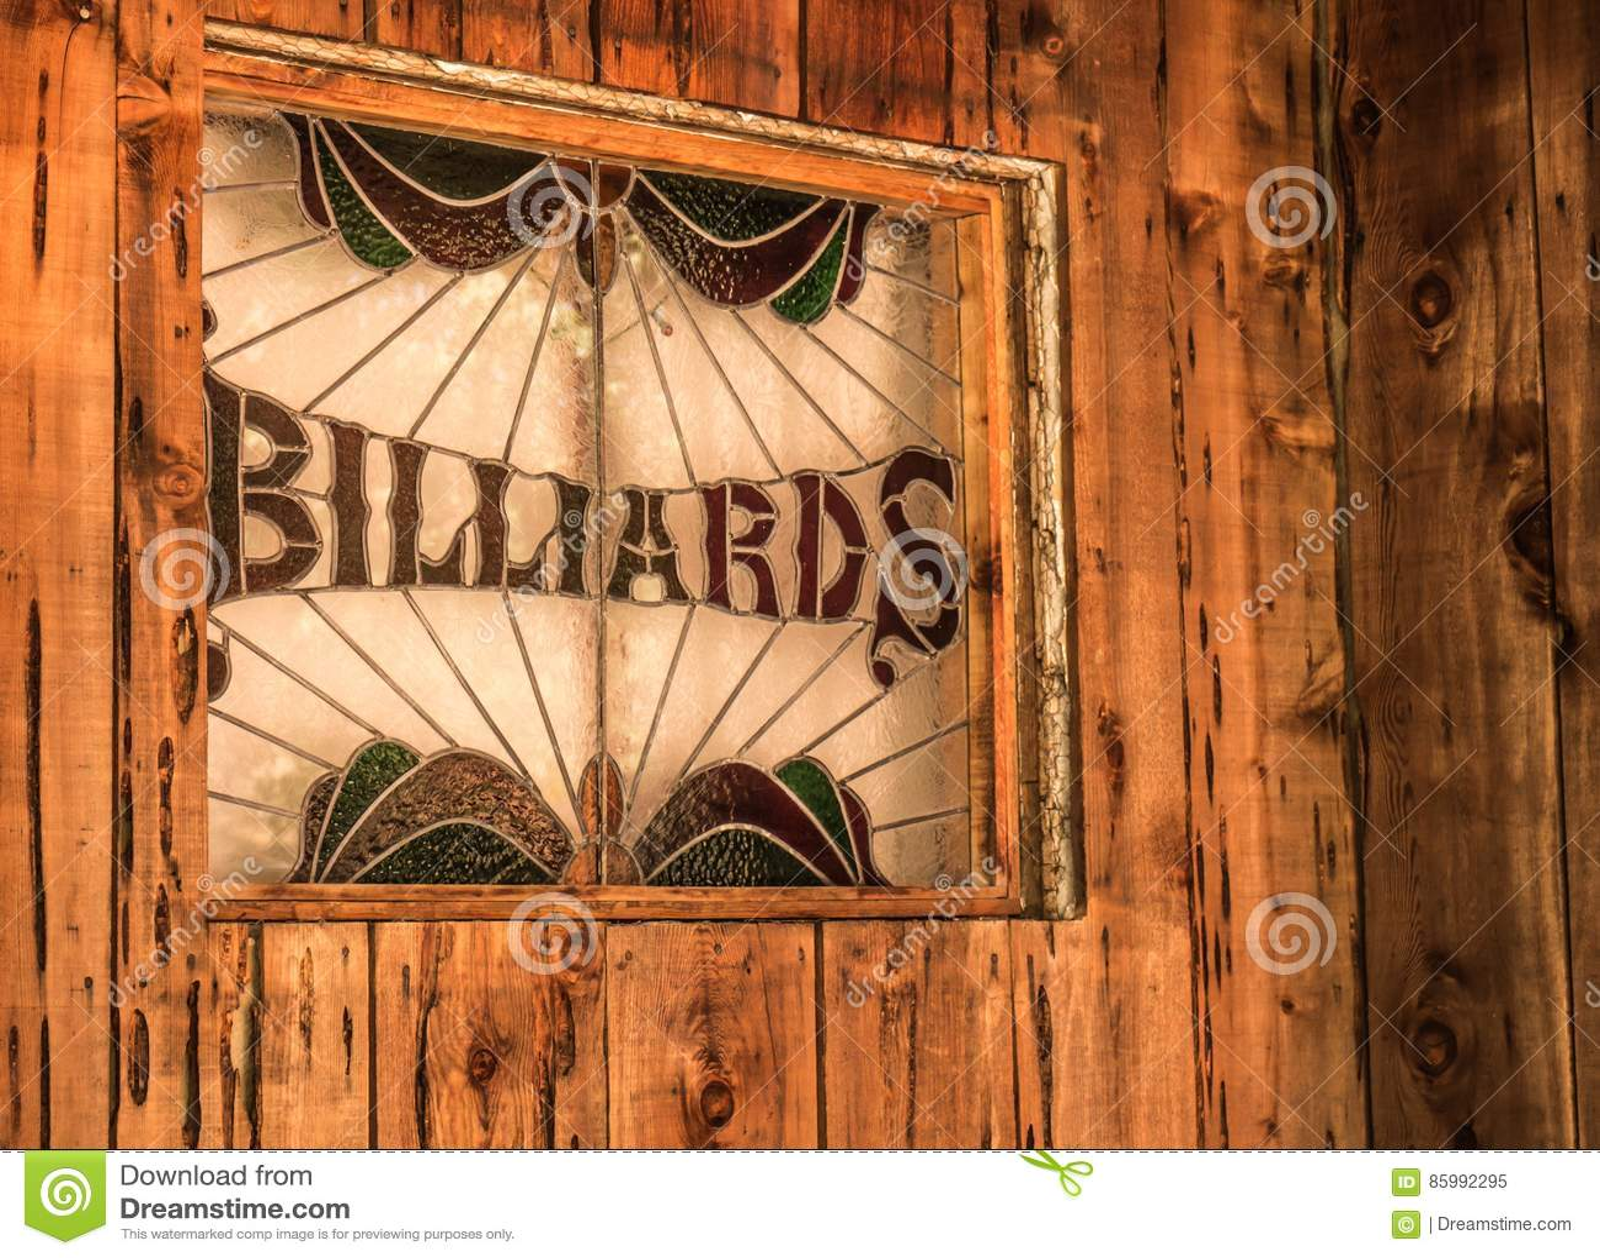 Rustic Billiards Sign